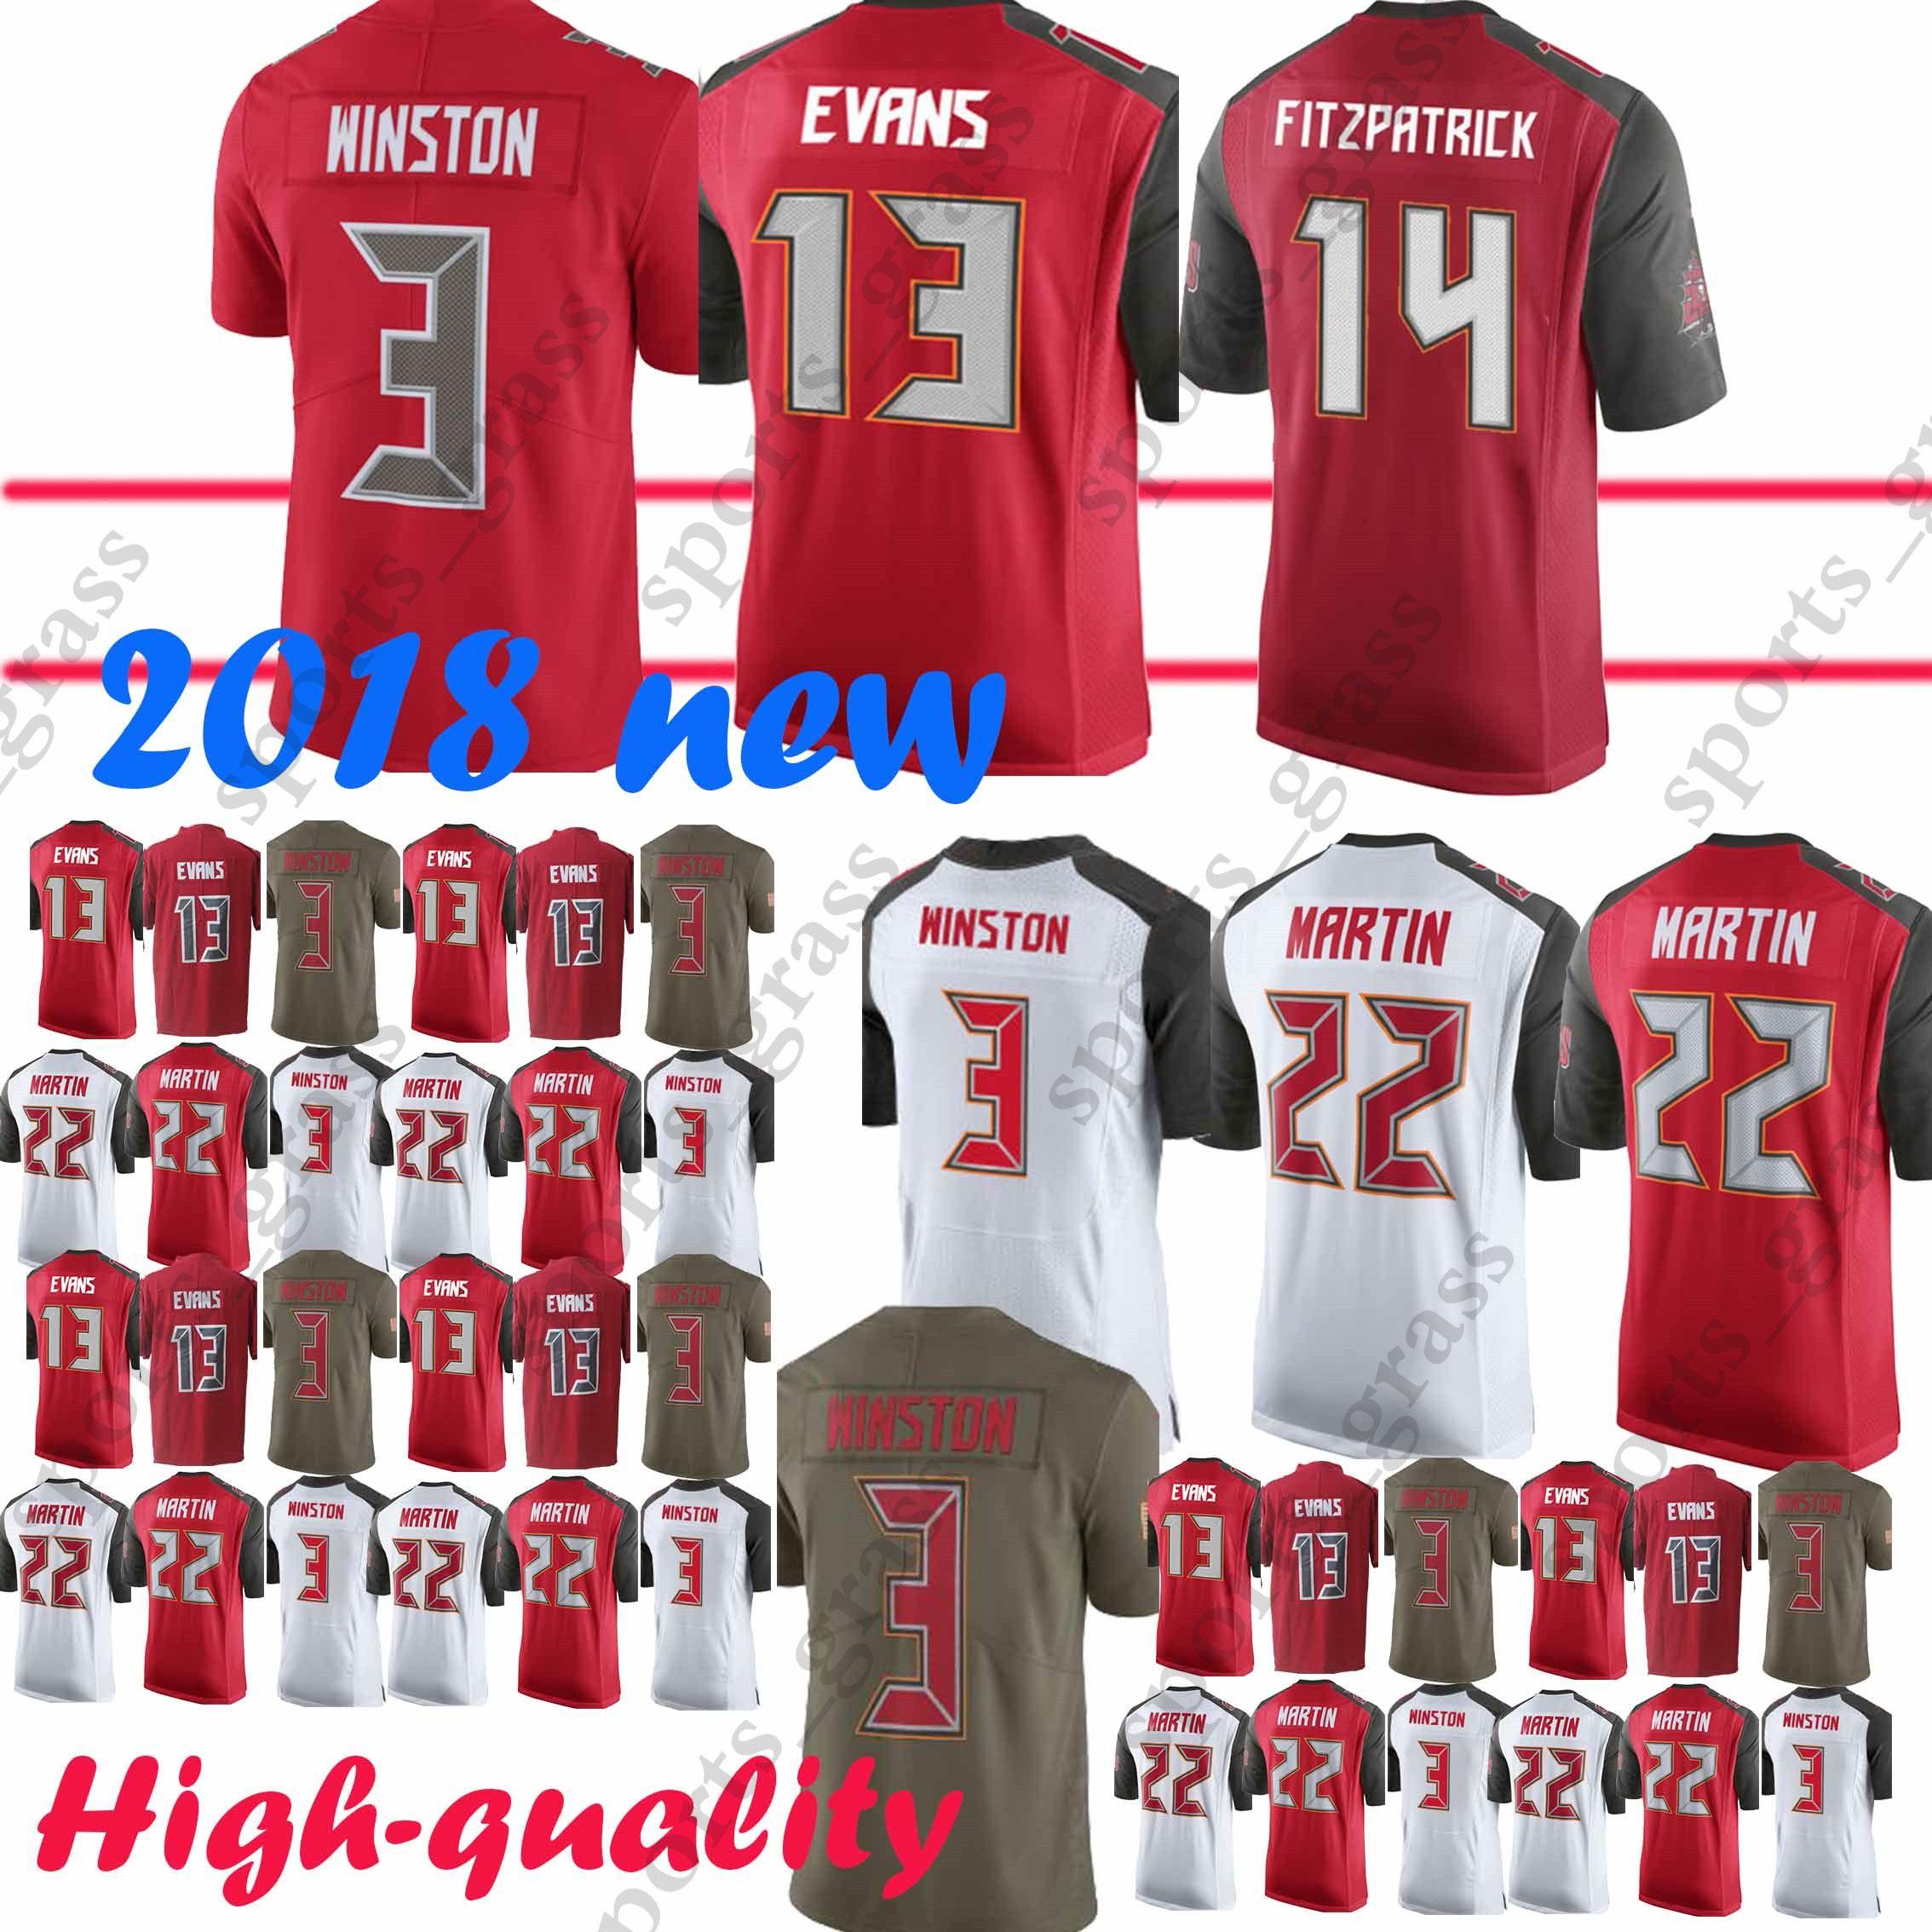 952ed4b12c8 Tampa Buccaneer Jersey 14 Ryan Fitzpatrick 3 Jameis Winston 22 Doug ...